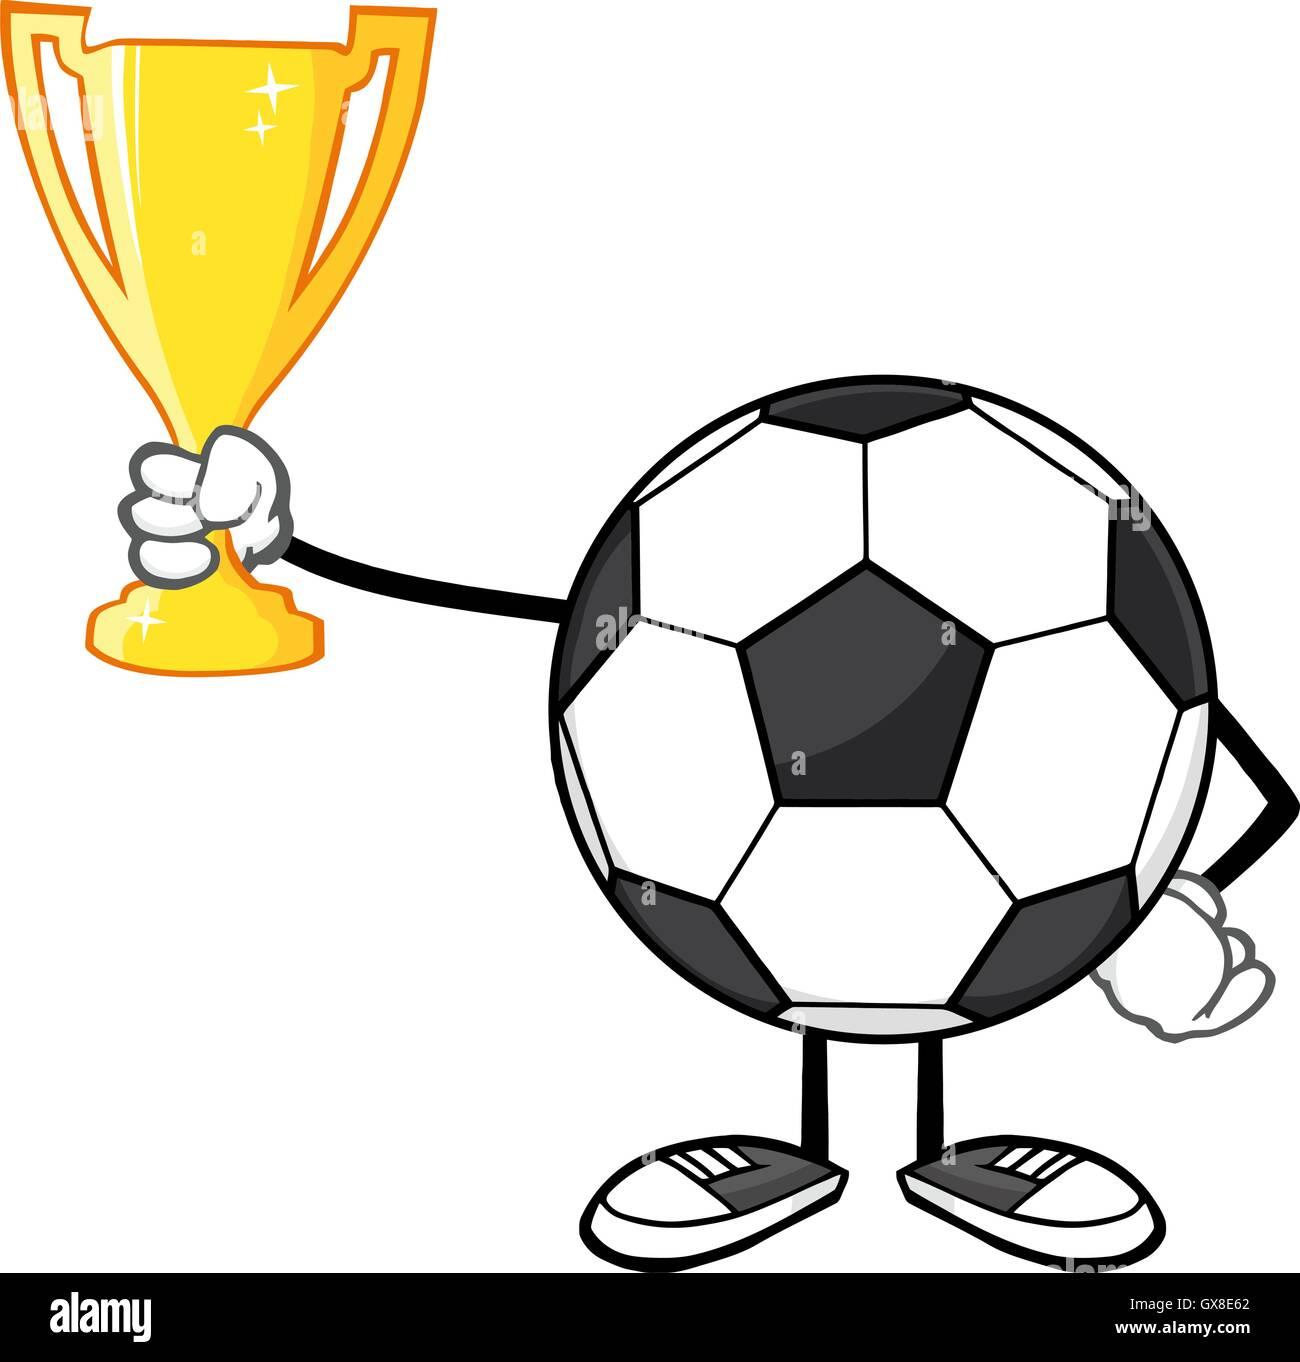 classic sport soccer goal instructions